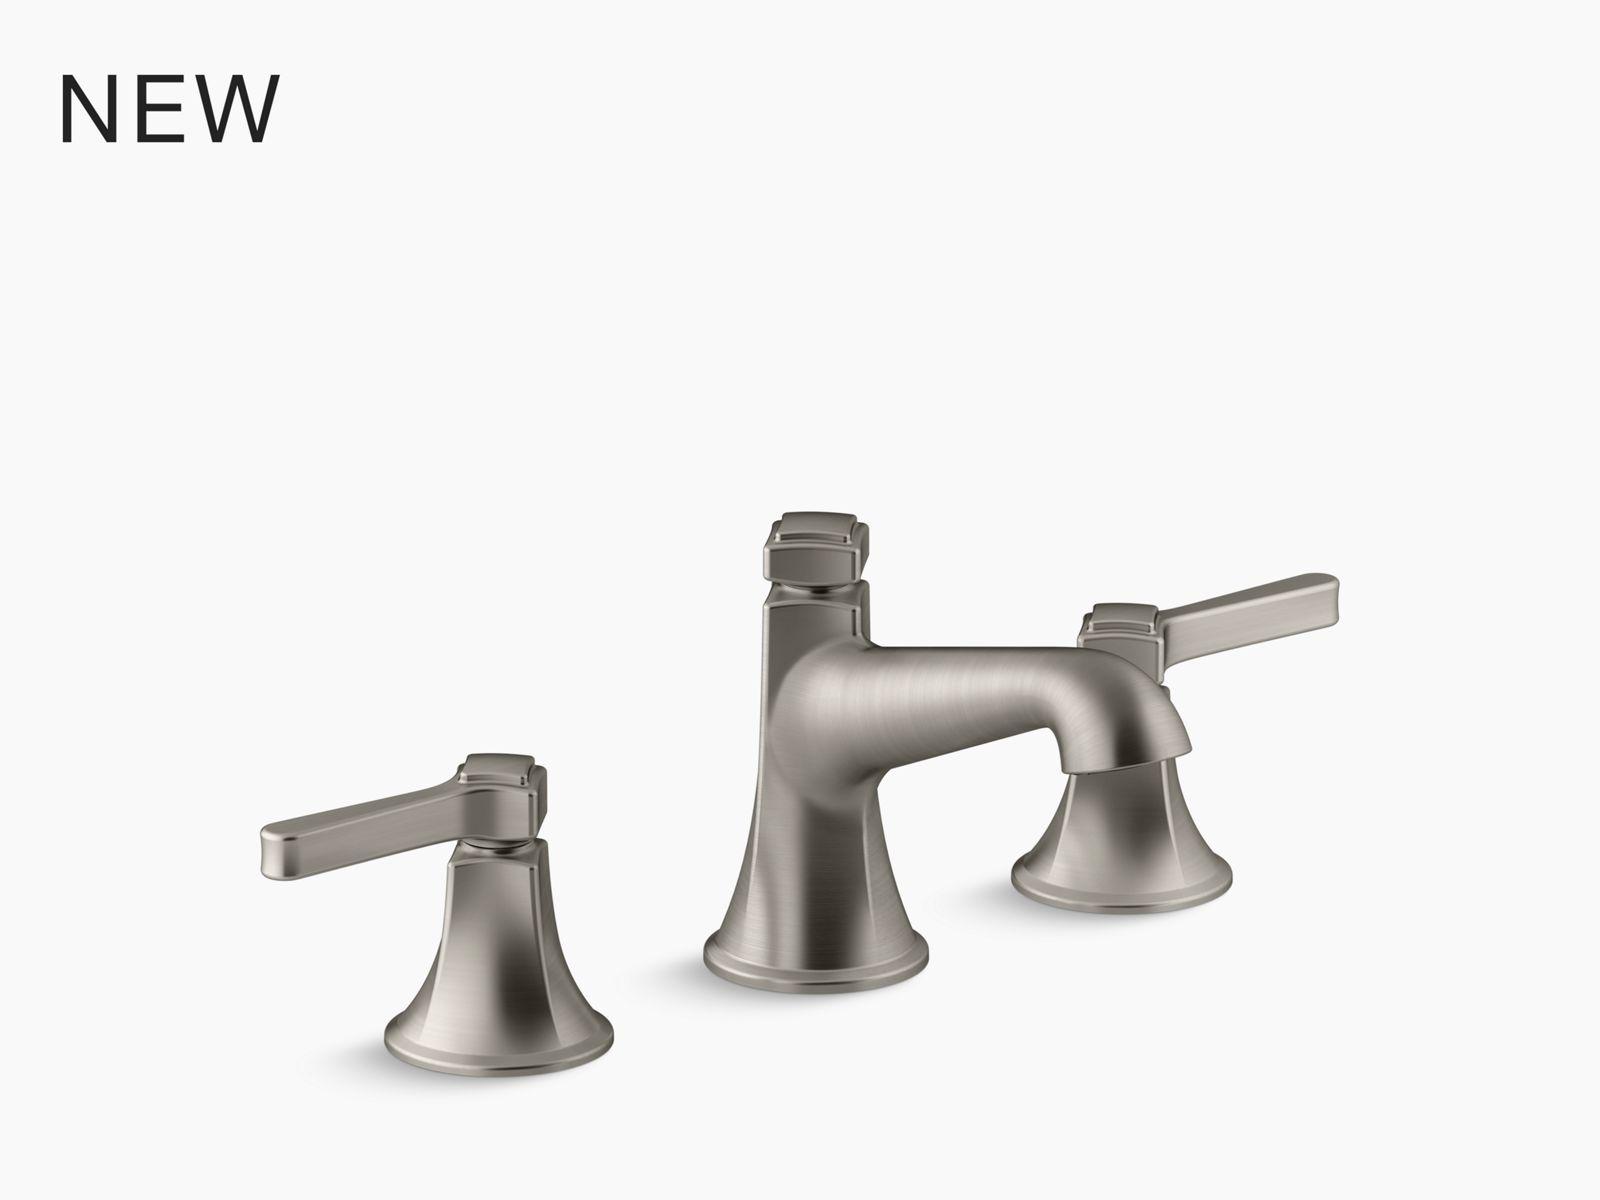 Kohler Bathroom Faucet Sets Bathroom Faucets Faucets Bathroom